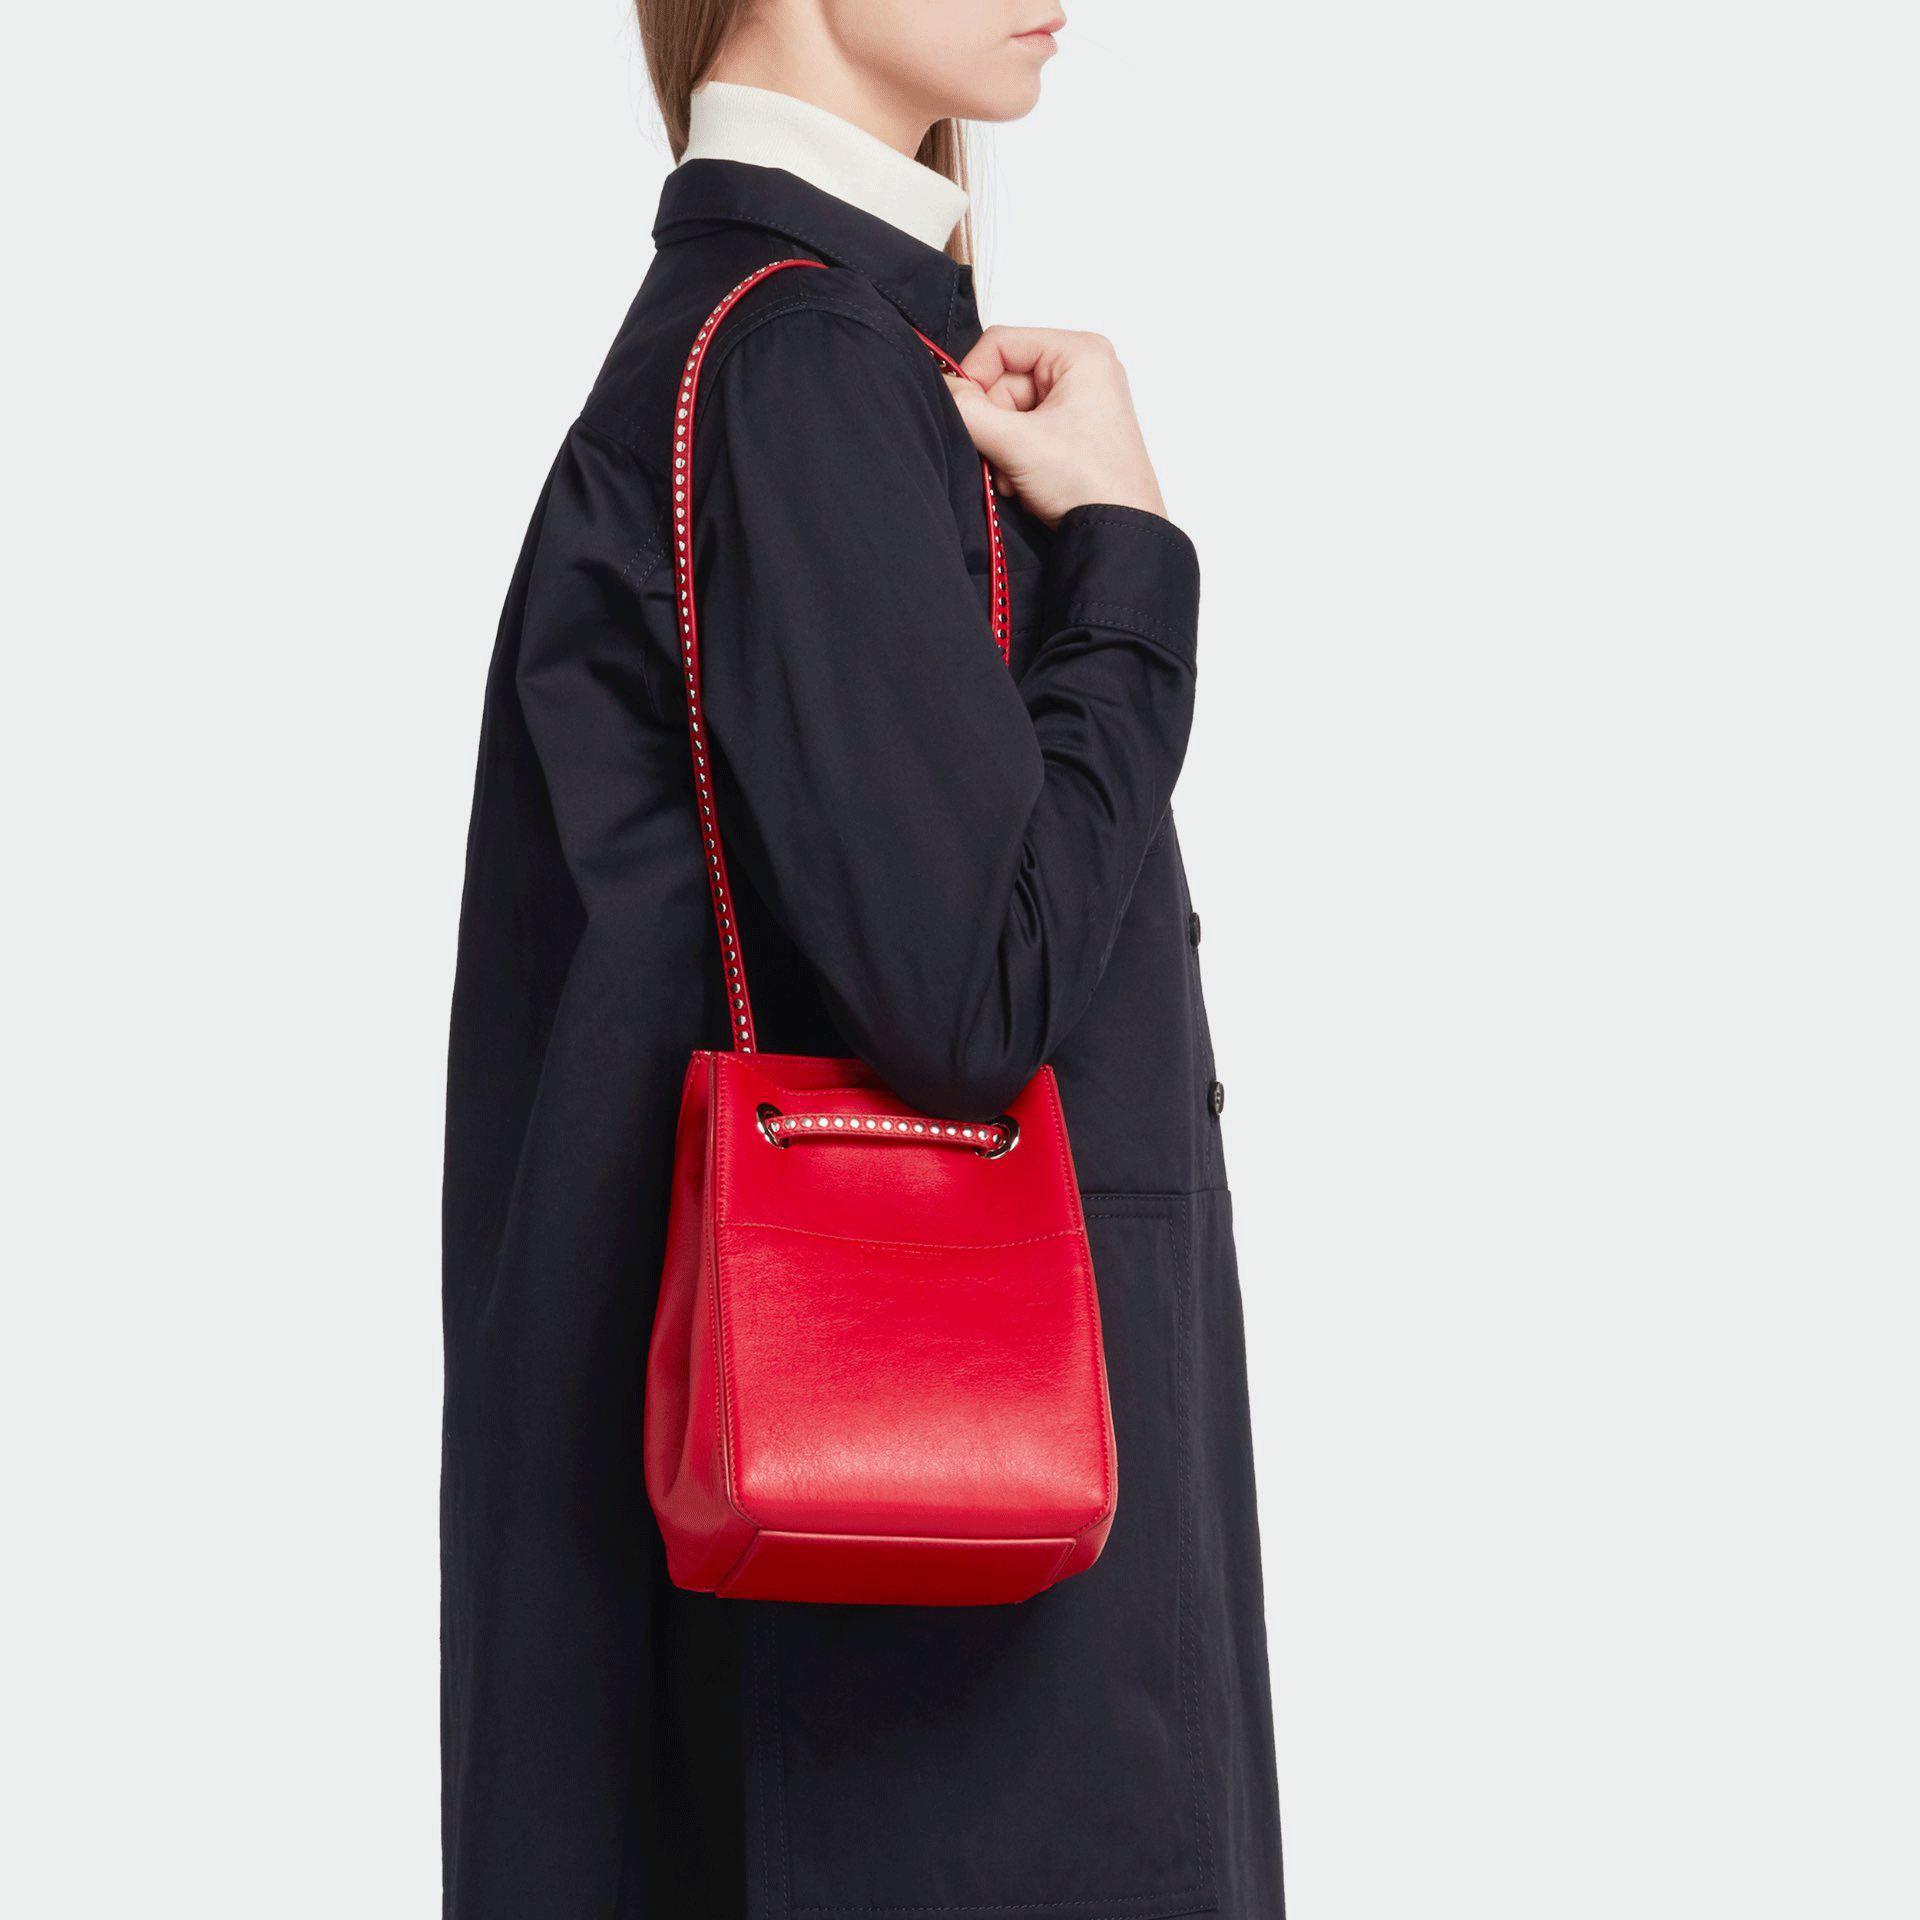 womenswear model wearing red J&M leather bag with dark blue coat